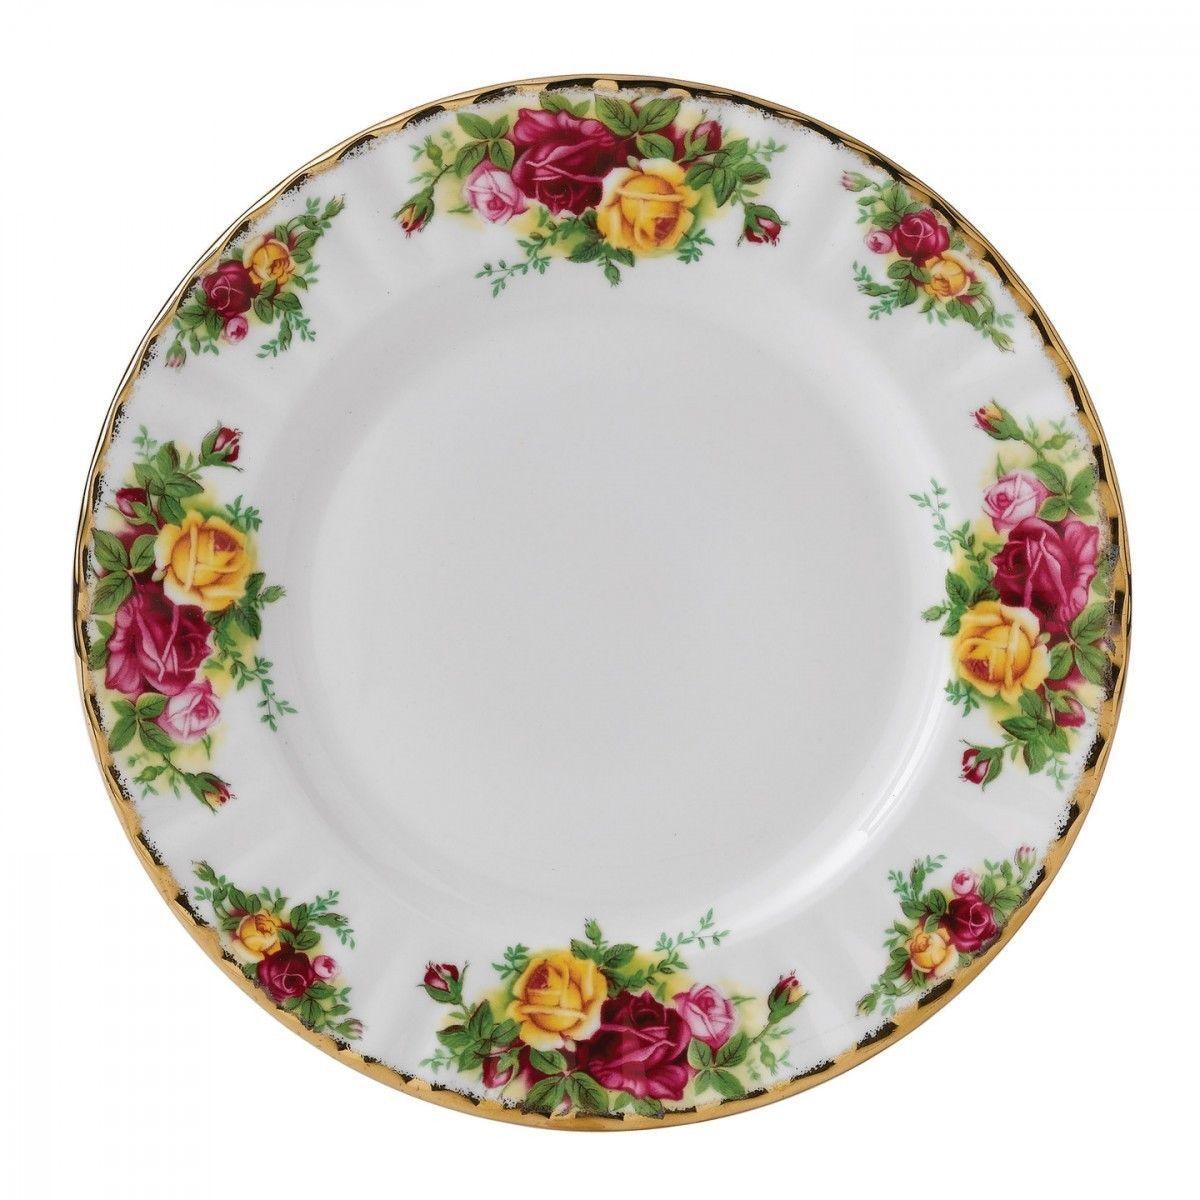 Royal Albert Country Roses Salad Plates (Set of 4)